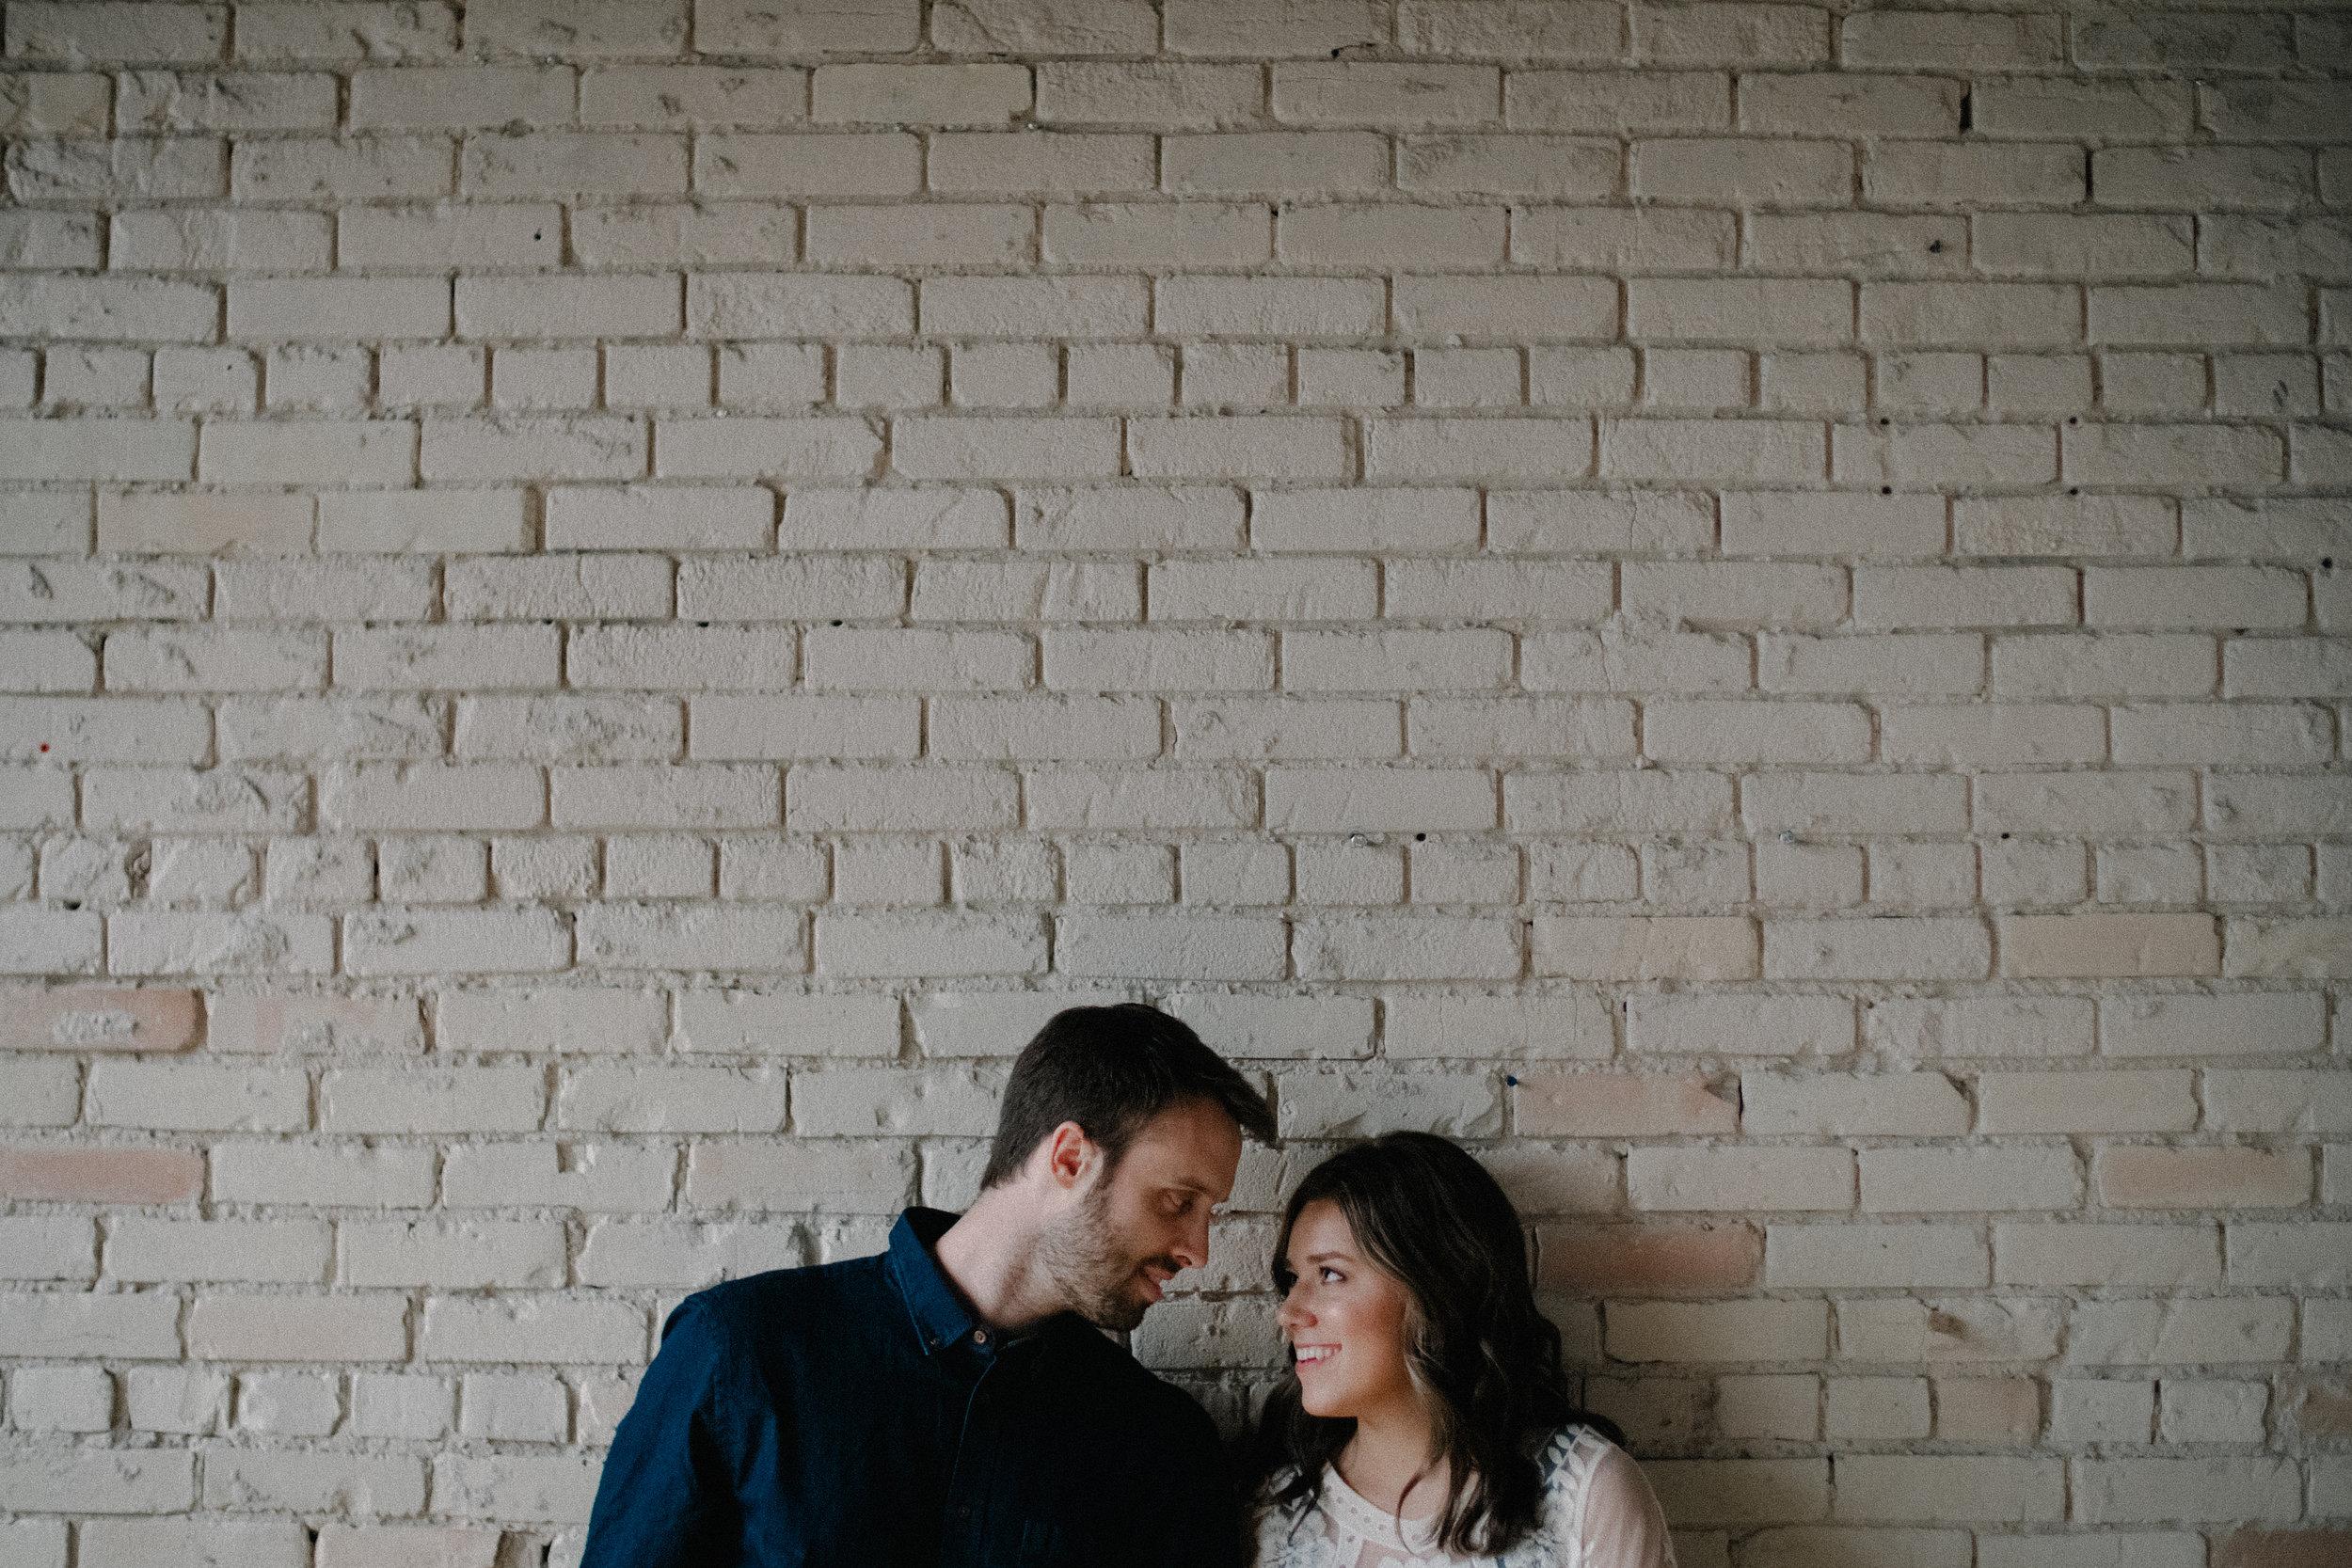 Lauren_Nick_Manzer_Bailey_Engagement_Photos_0044.jpg